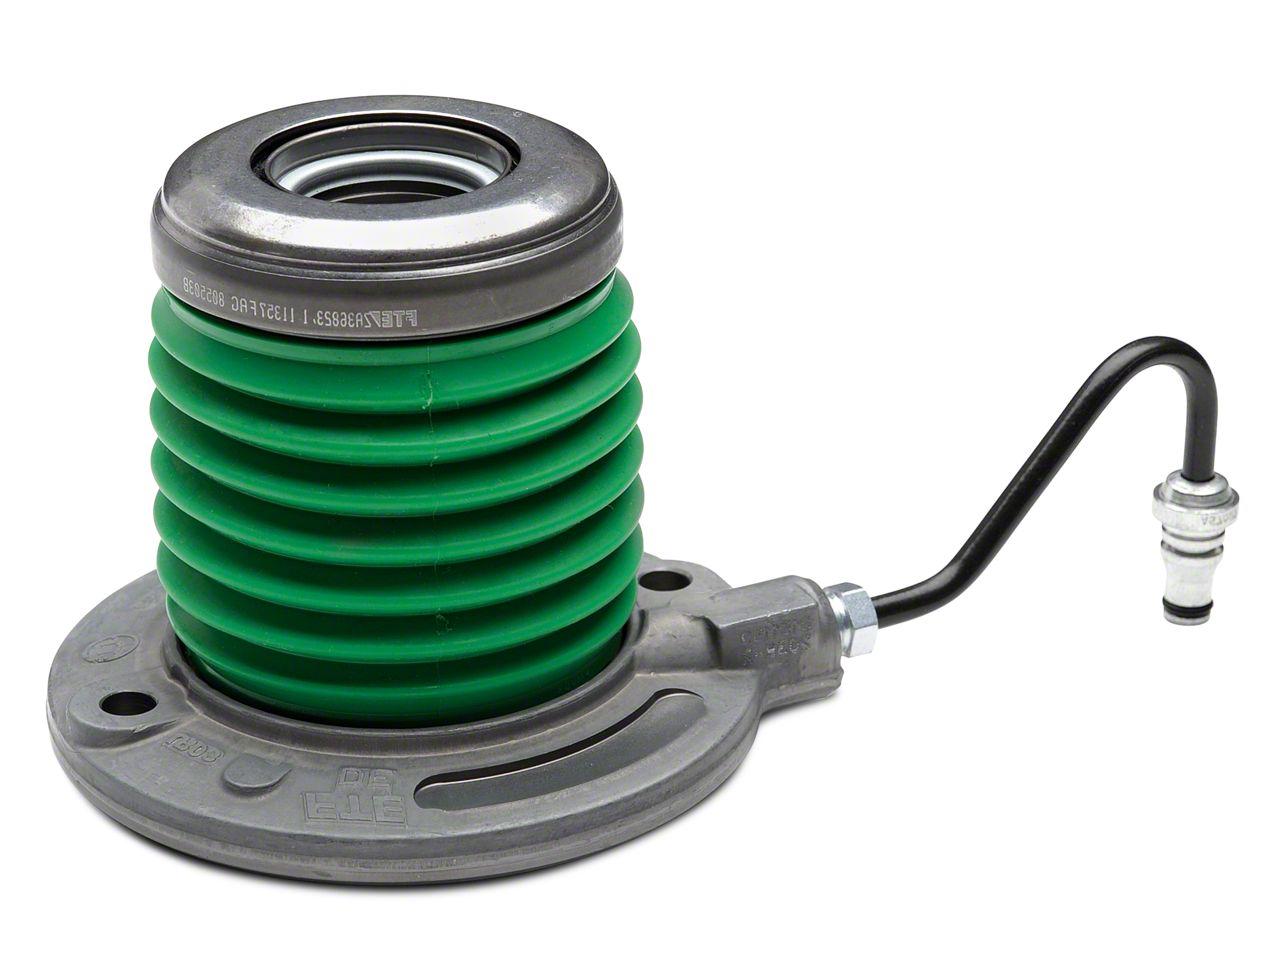 Exedy Hydraulic Throwout Bearing/Slave Cylinder (05-10 GT